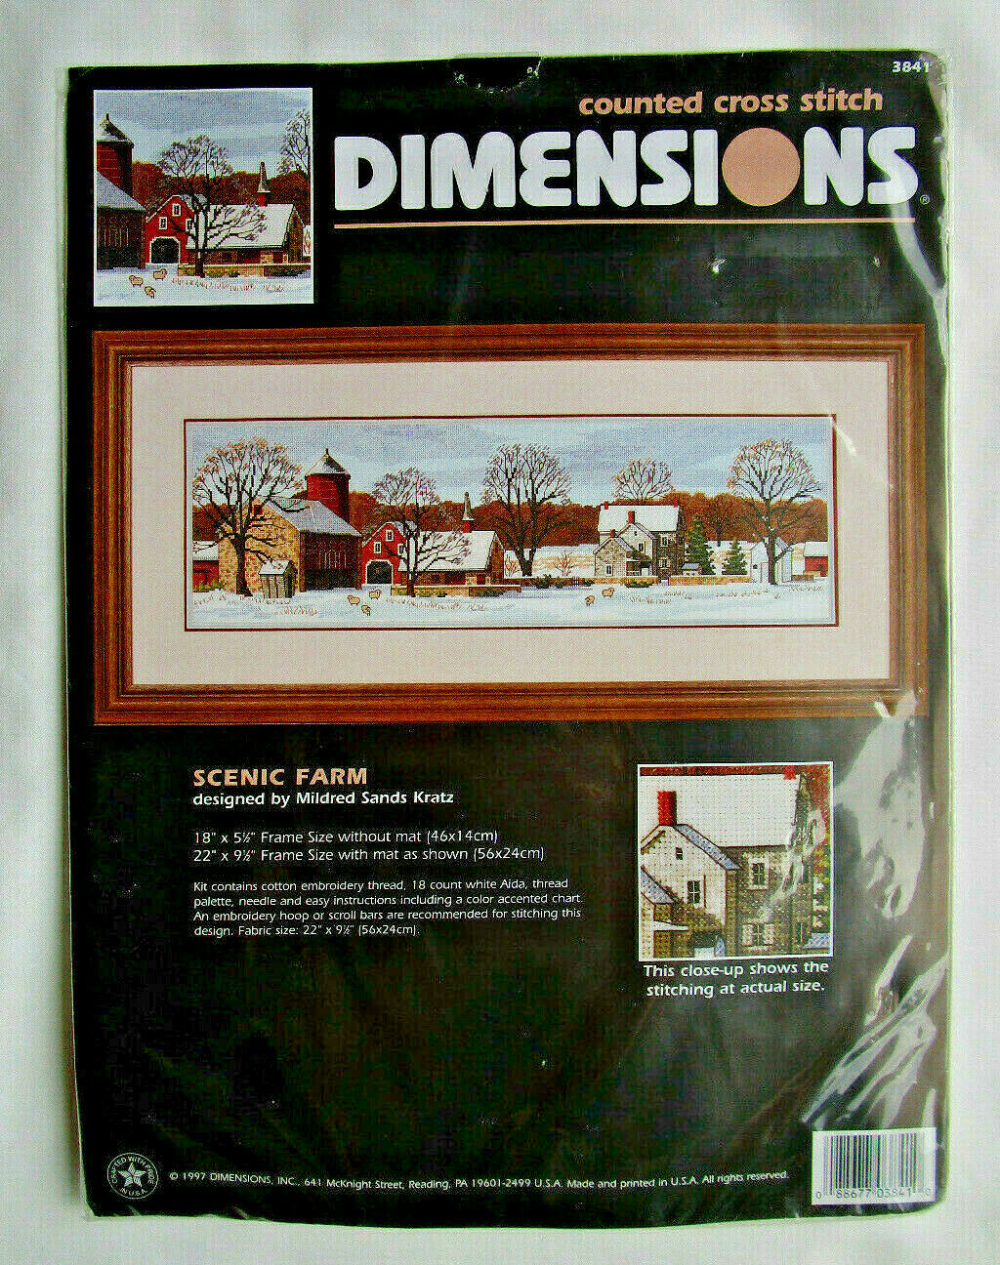 Scenic Farm Dimensions Counted Cross Stitch Kit